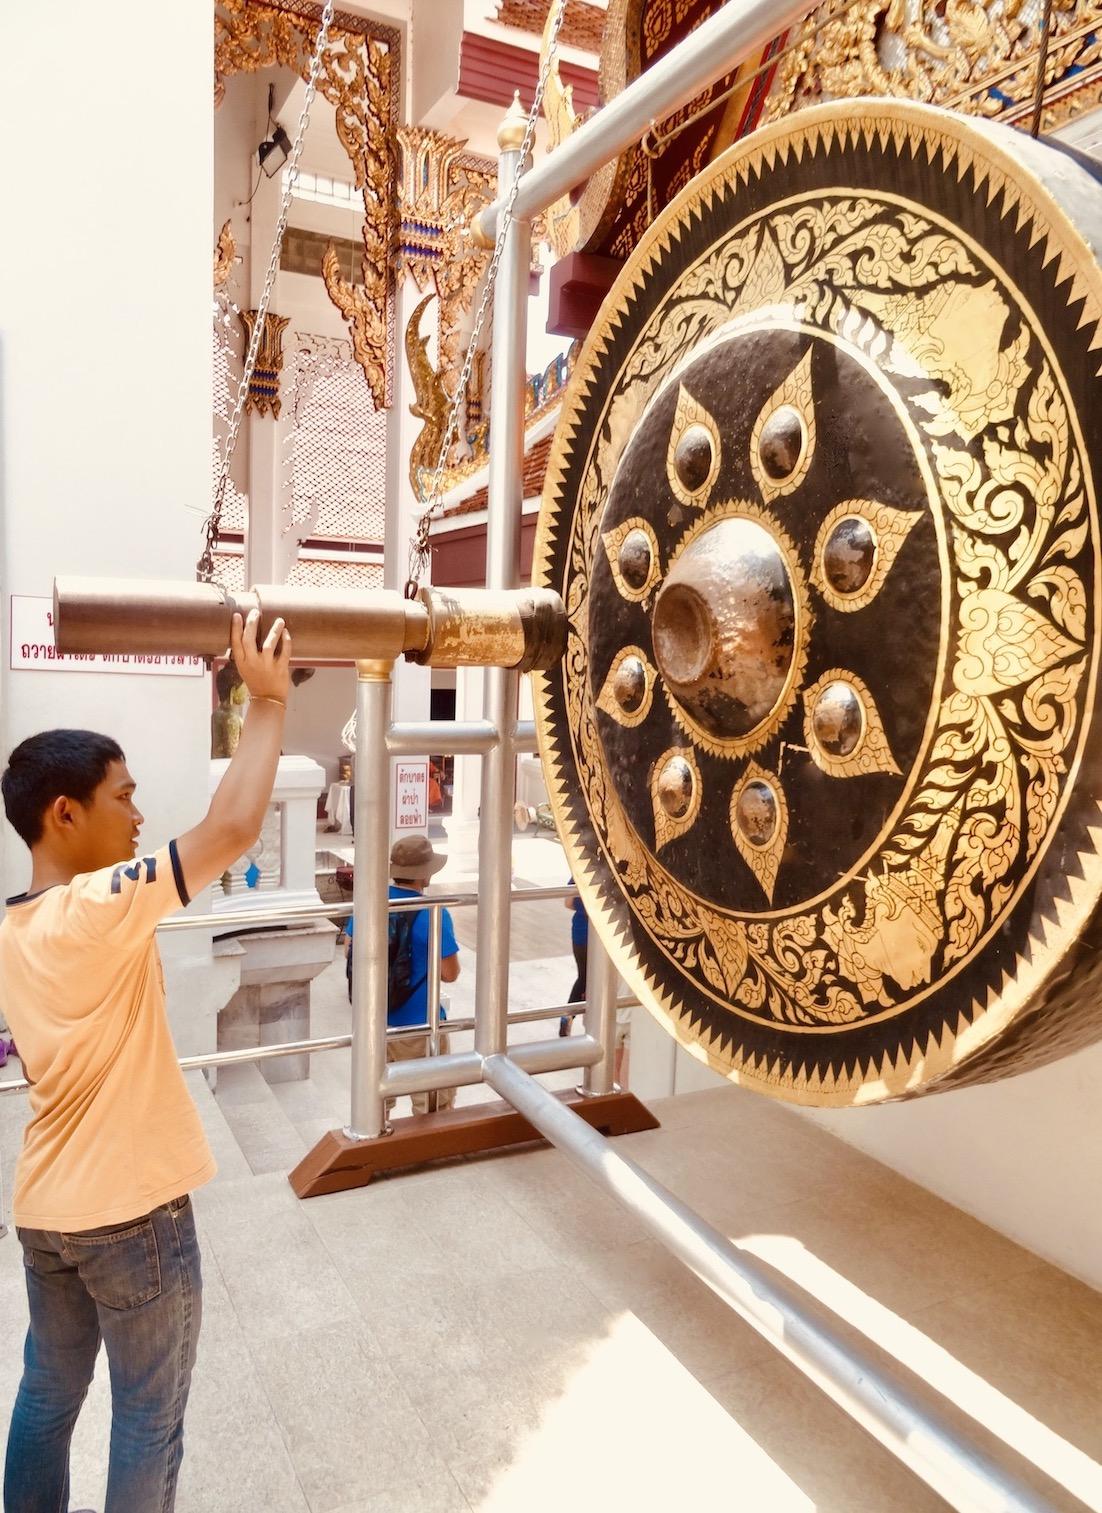 Giant metal gong Wat Saket The Golden Mount